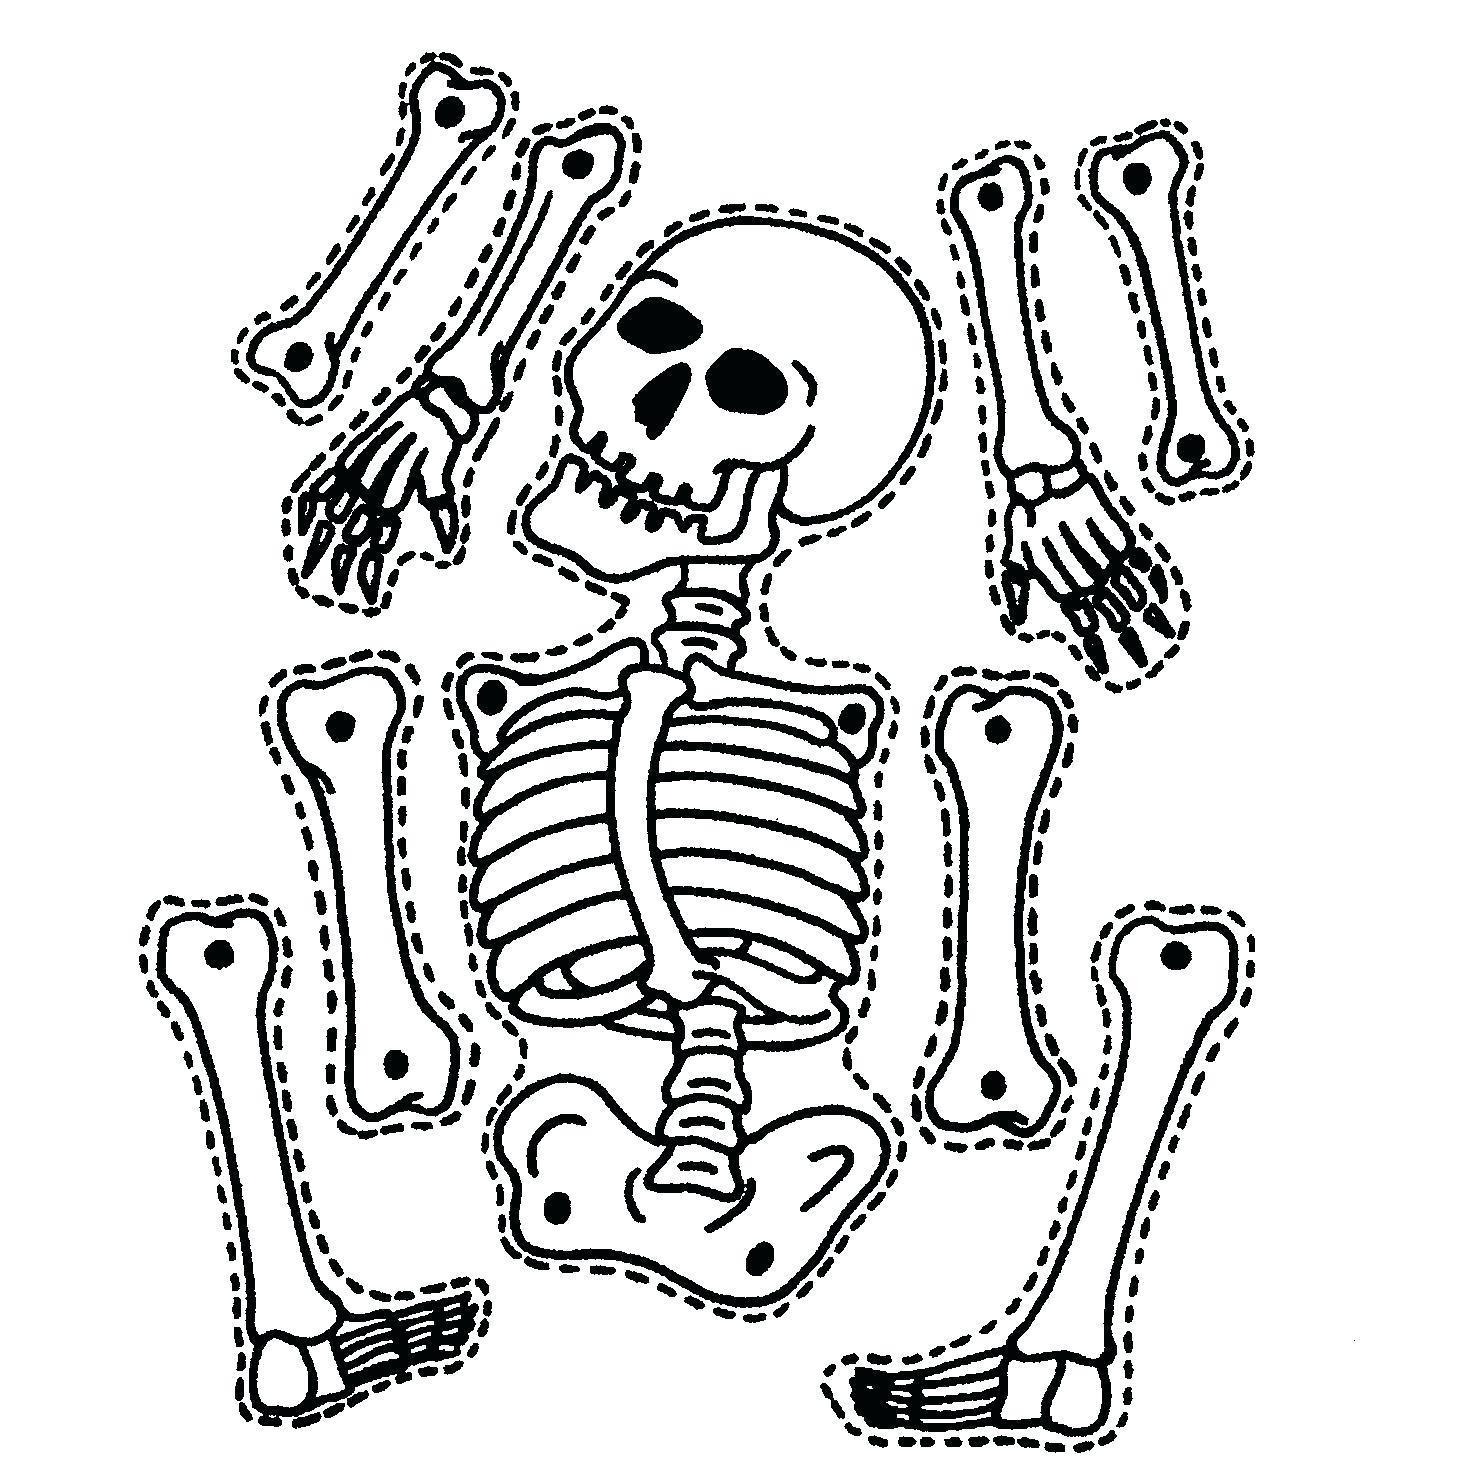 hight resolution of 1481x1484 diagram sea animal skeleton diagram